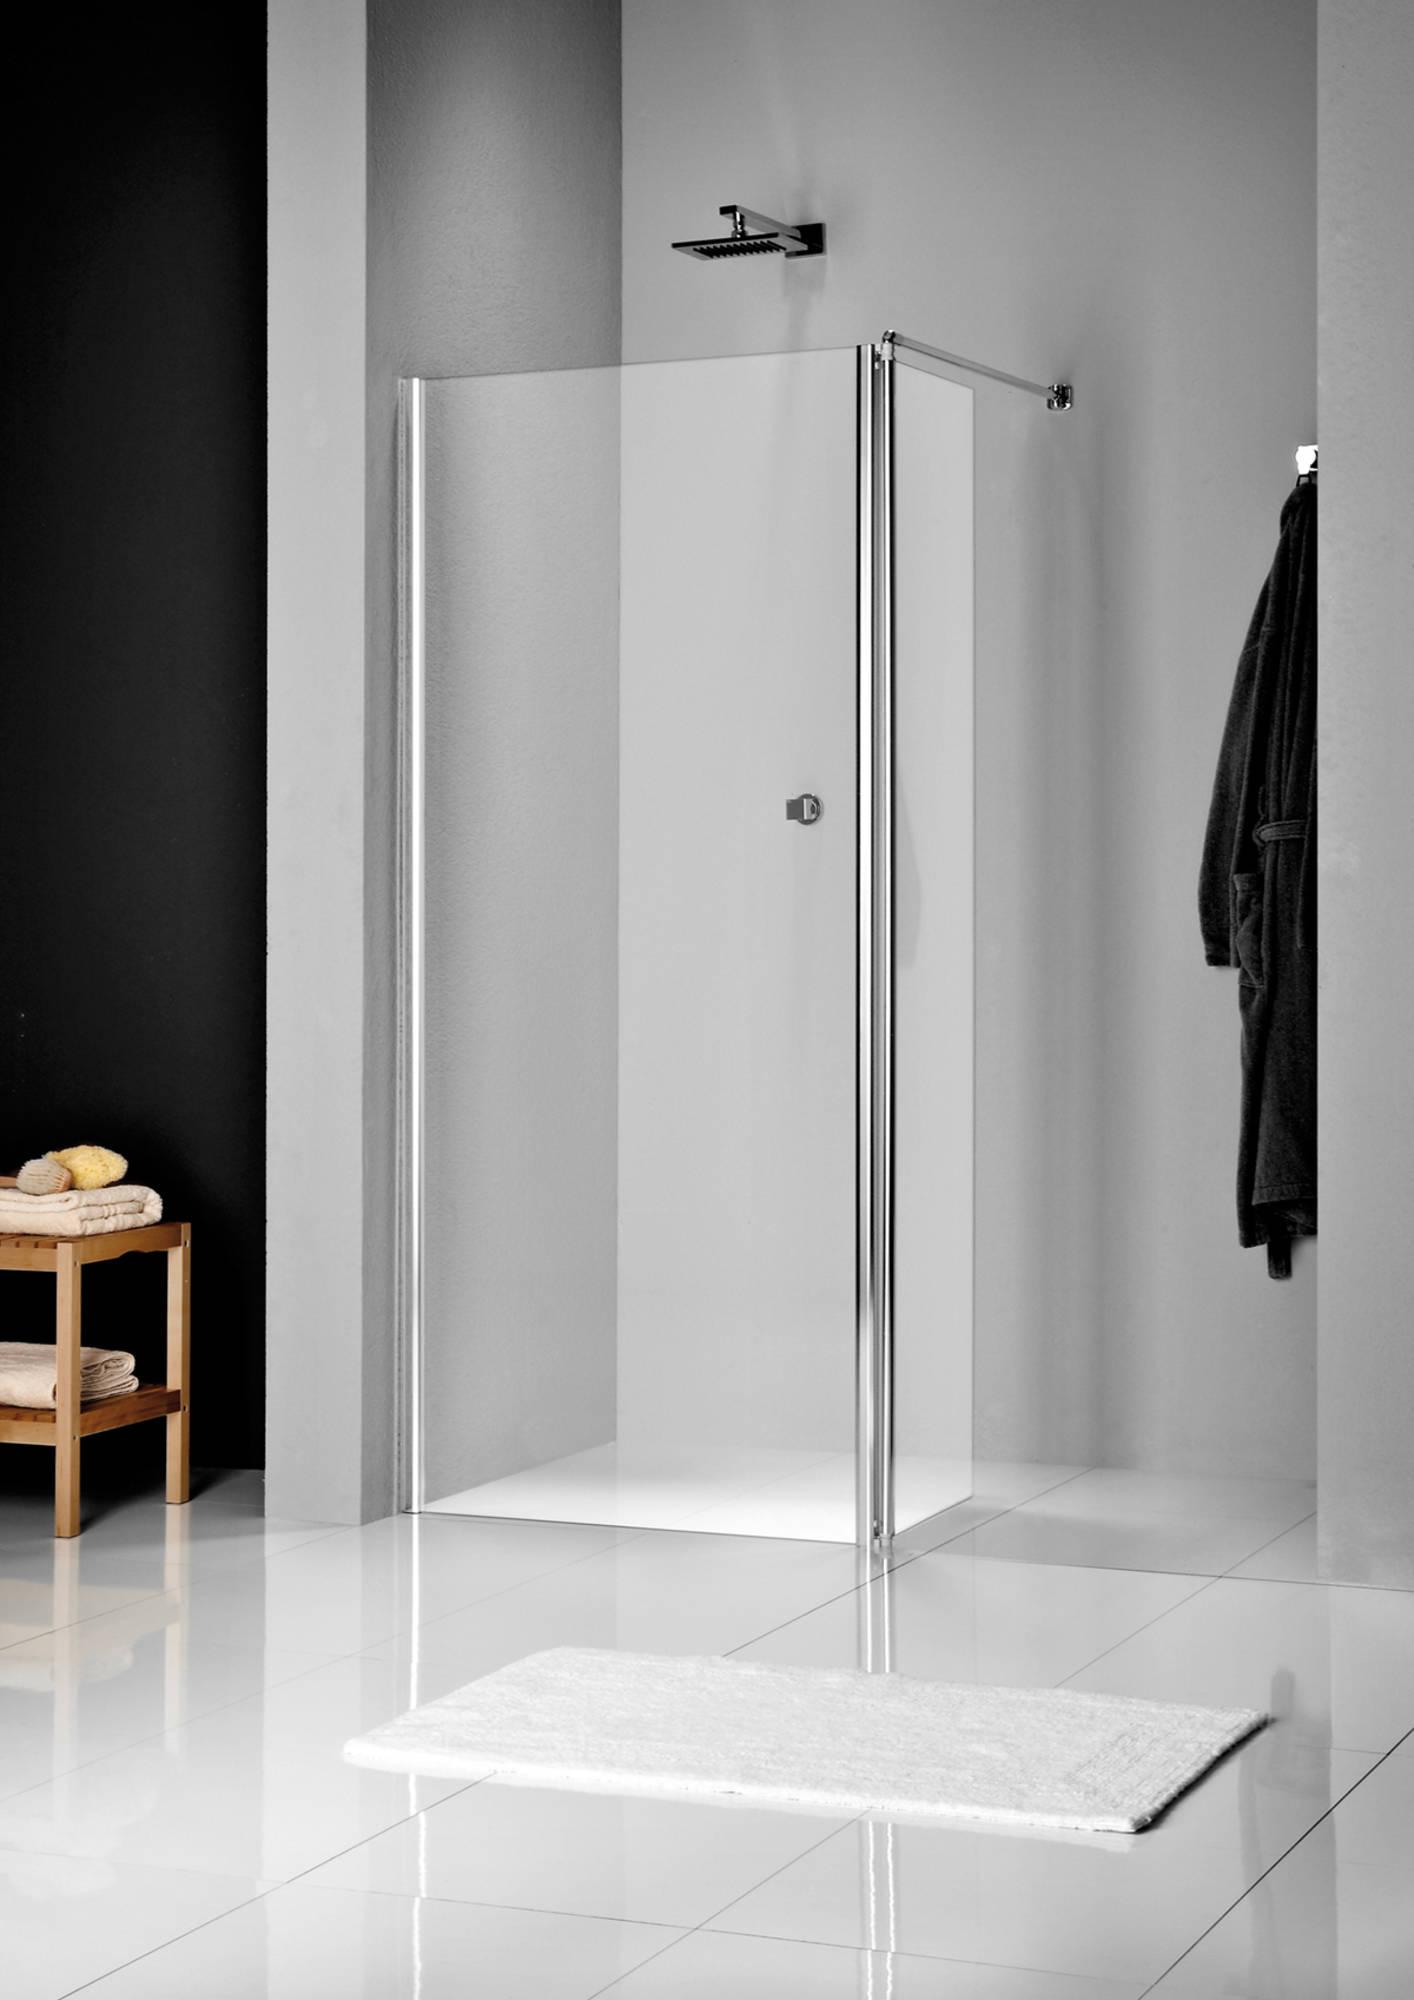 Sealskin Get Wet W205 inloop type a1 120x200cm mat zilver profiel en helder glas